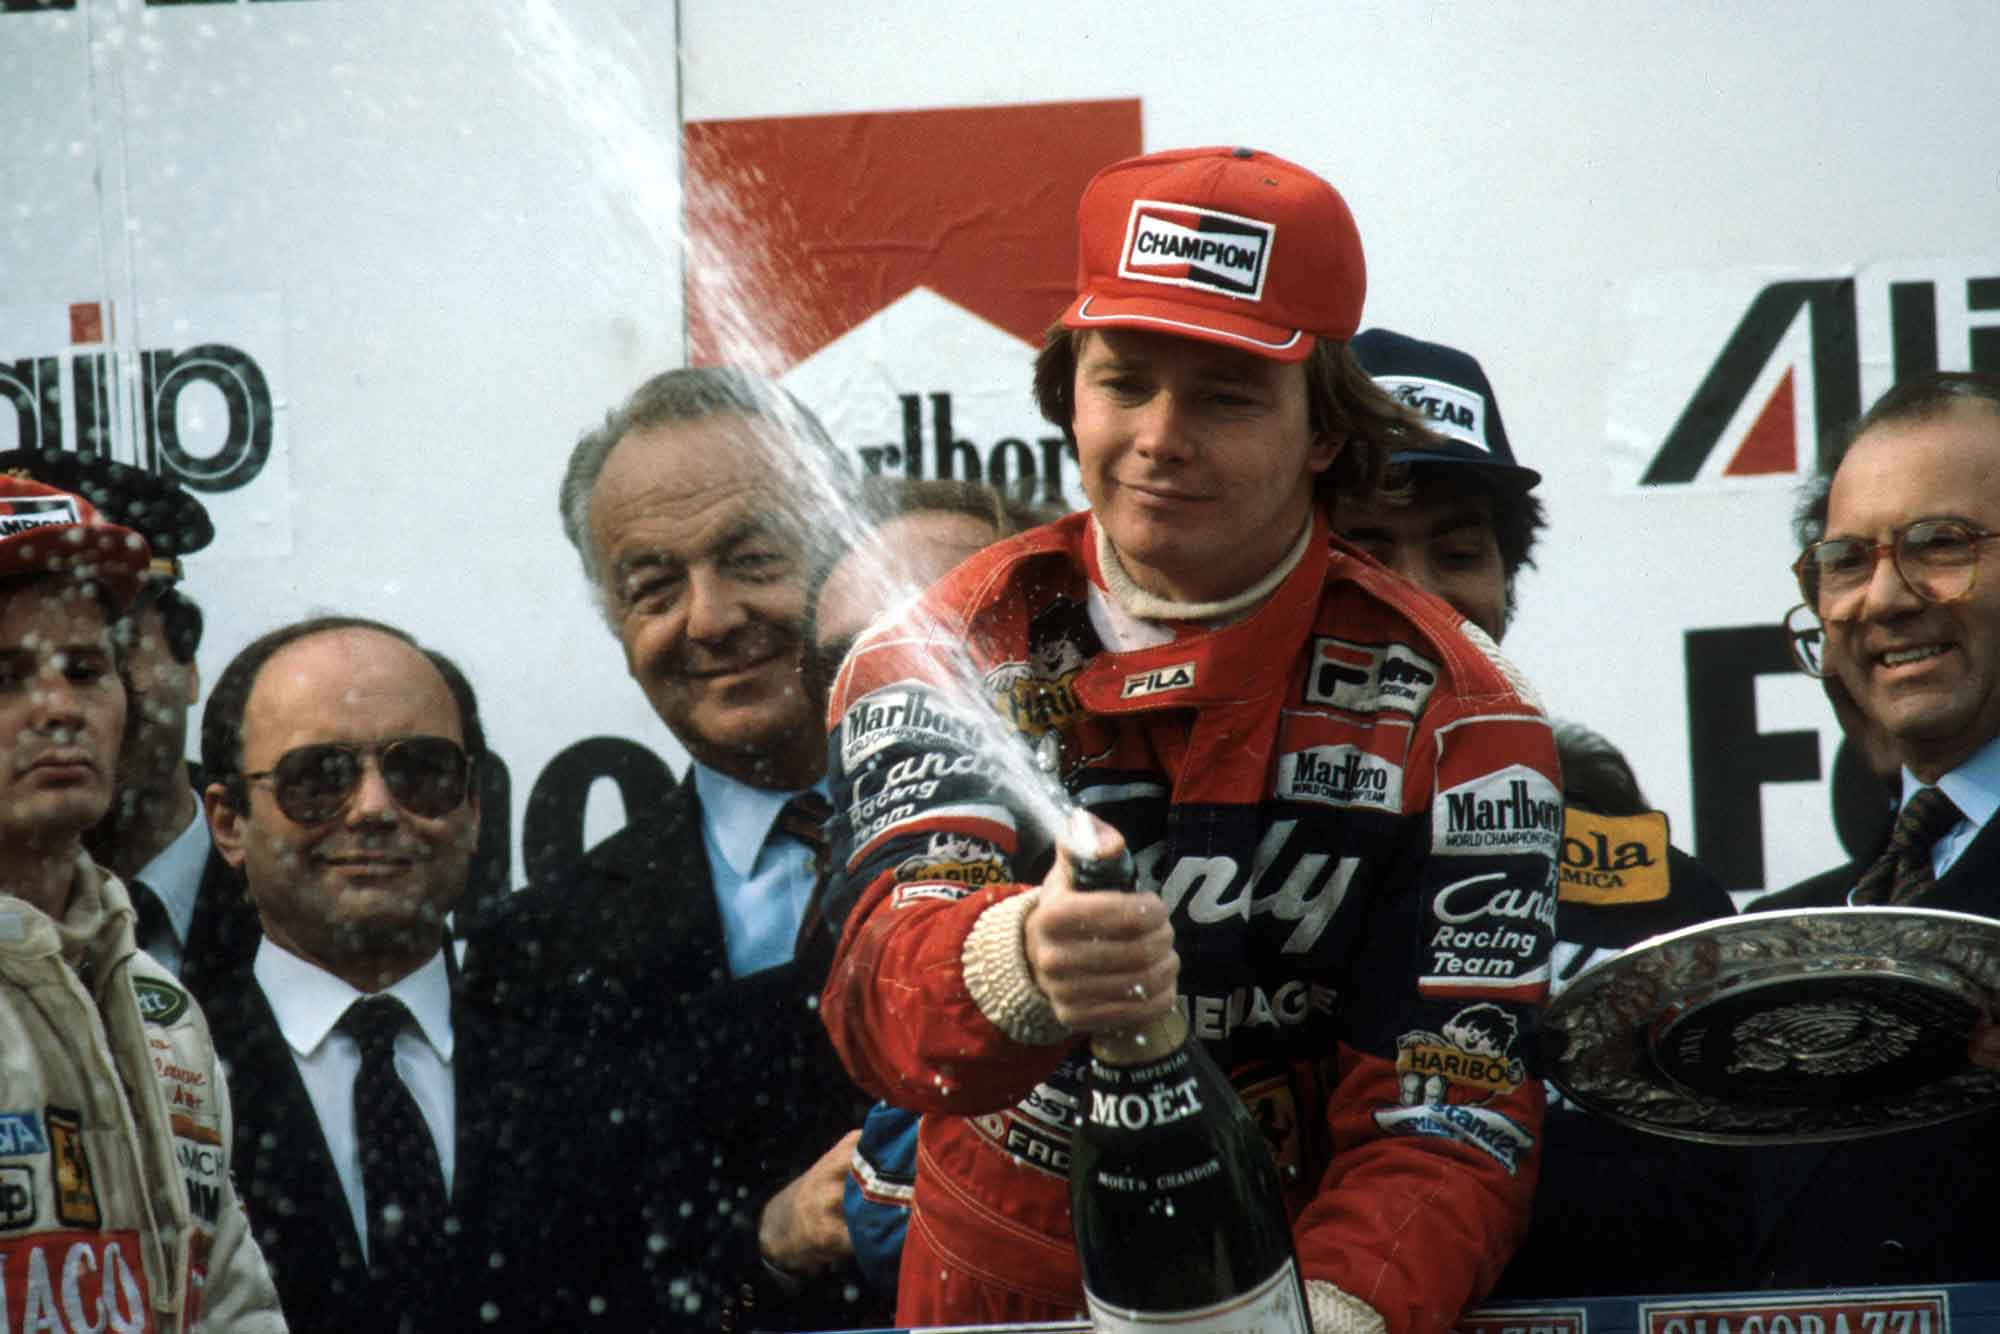 Didier Pironi celebrates on the podium after winning the 1982 San Marino Grand Prix Imola